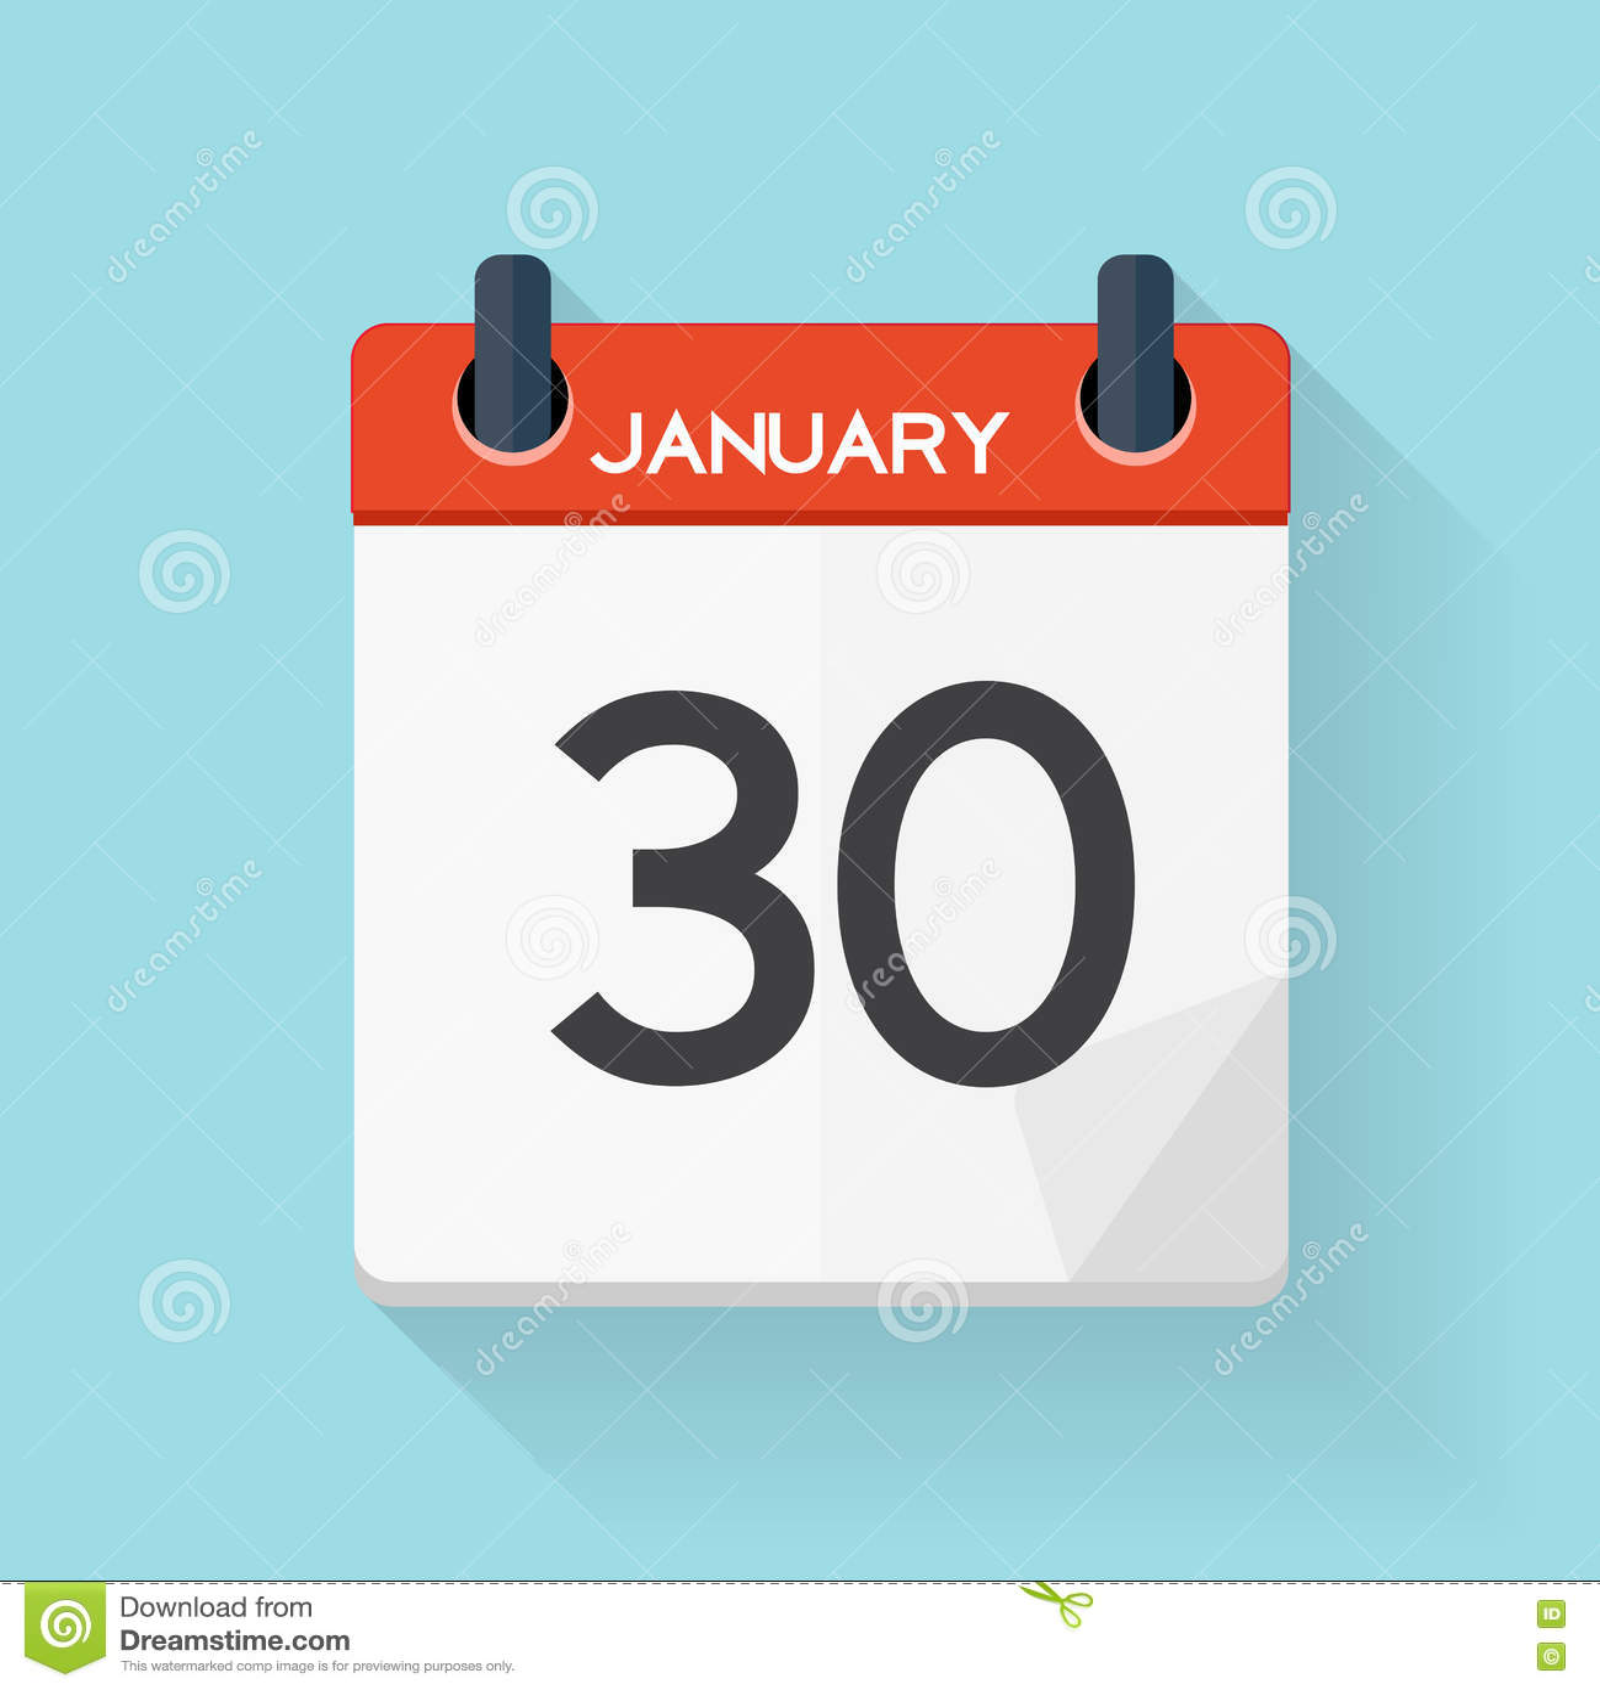 January 30 Calendar Flat Daily Icon. Vector Illustration Emblem.